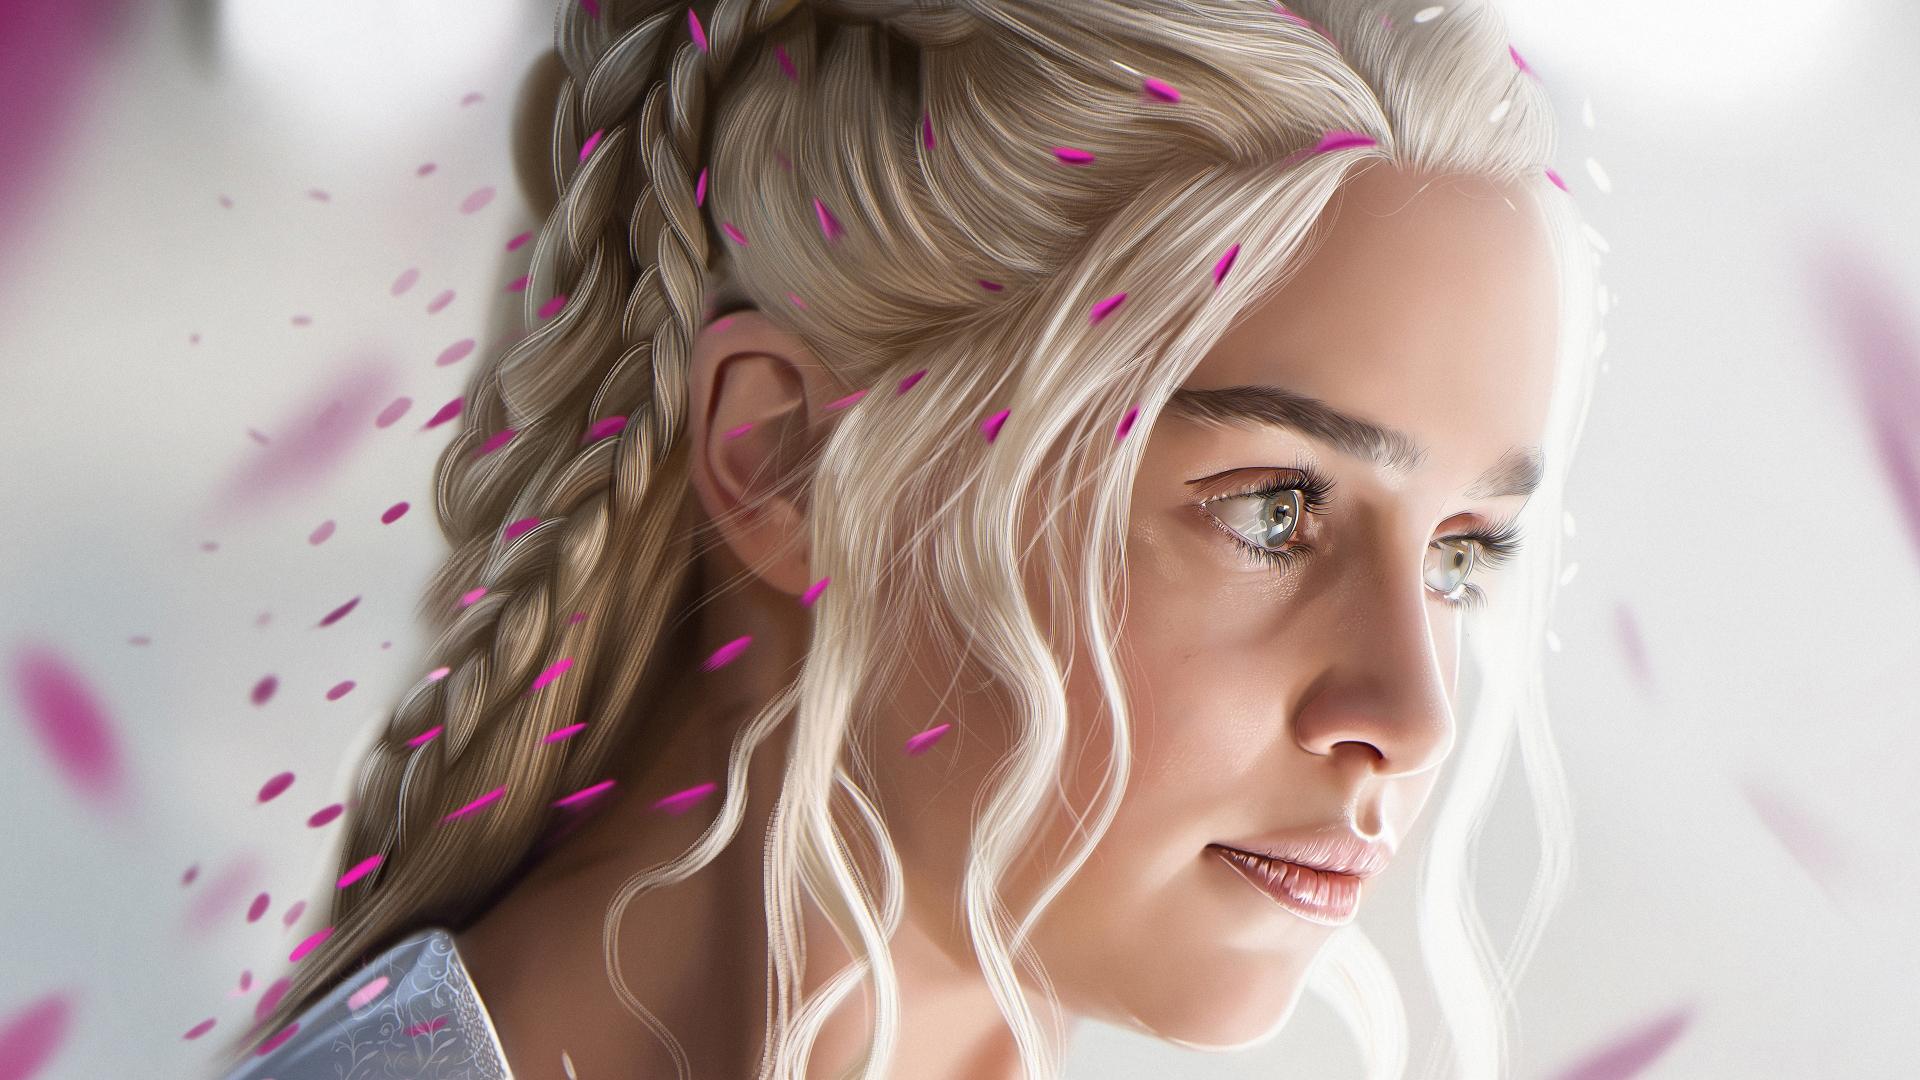 El rostro de Daenerys Targaryan - 1920x1080